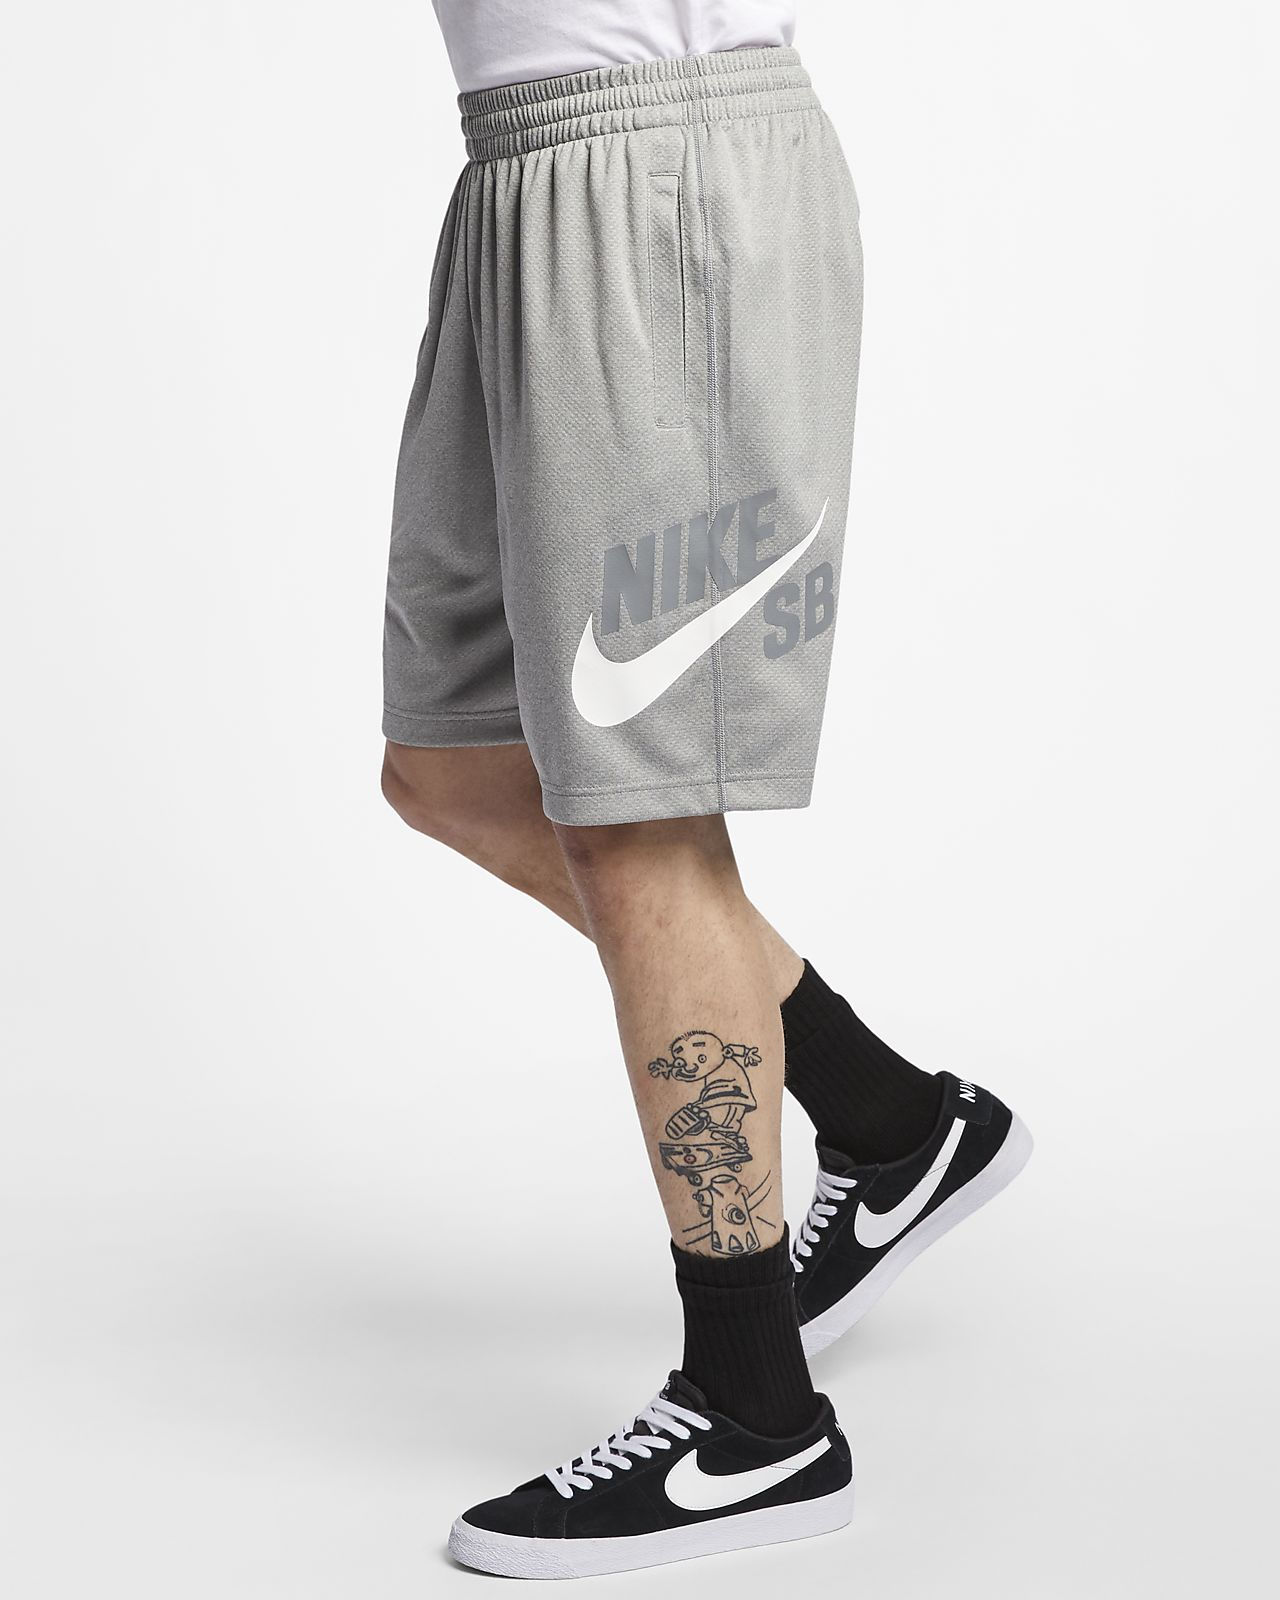 Nike SB Dri-FIT Sunday Skate-Shorts für Herren